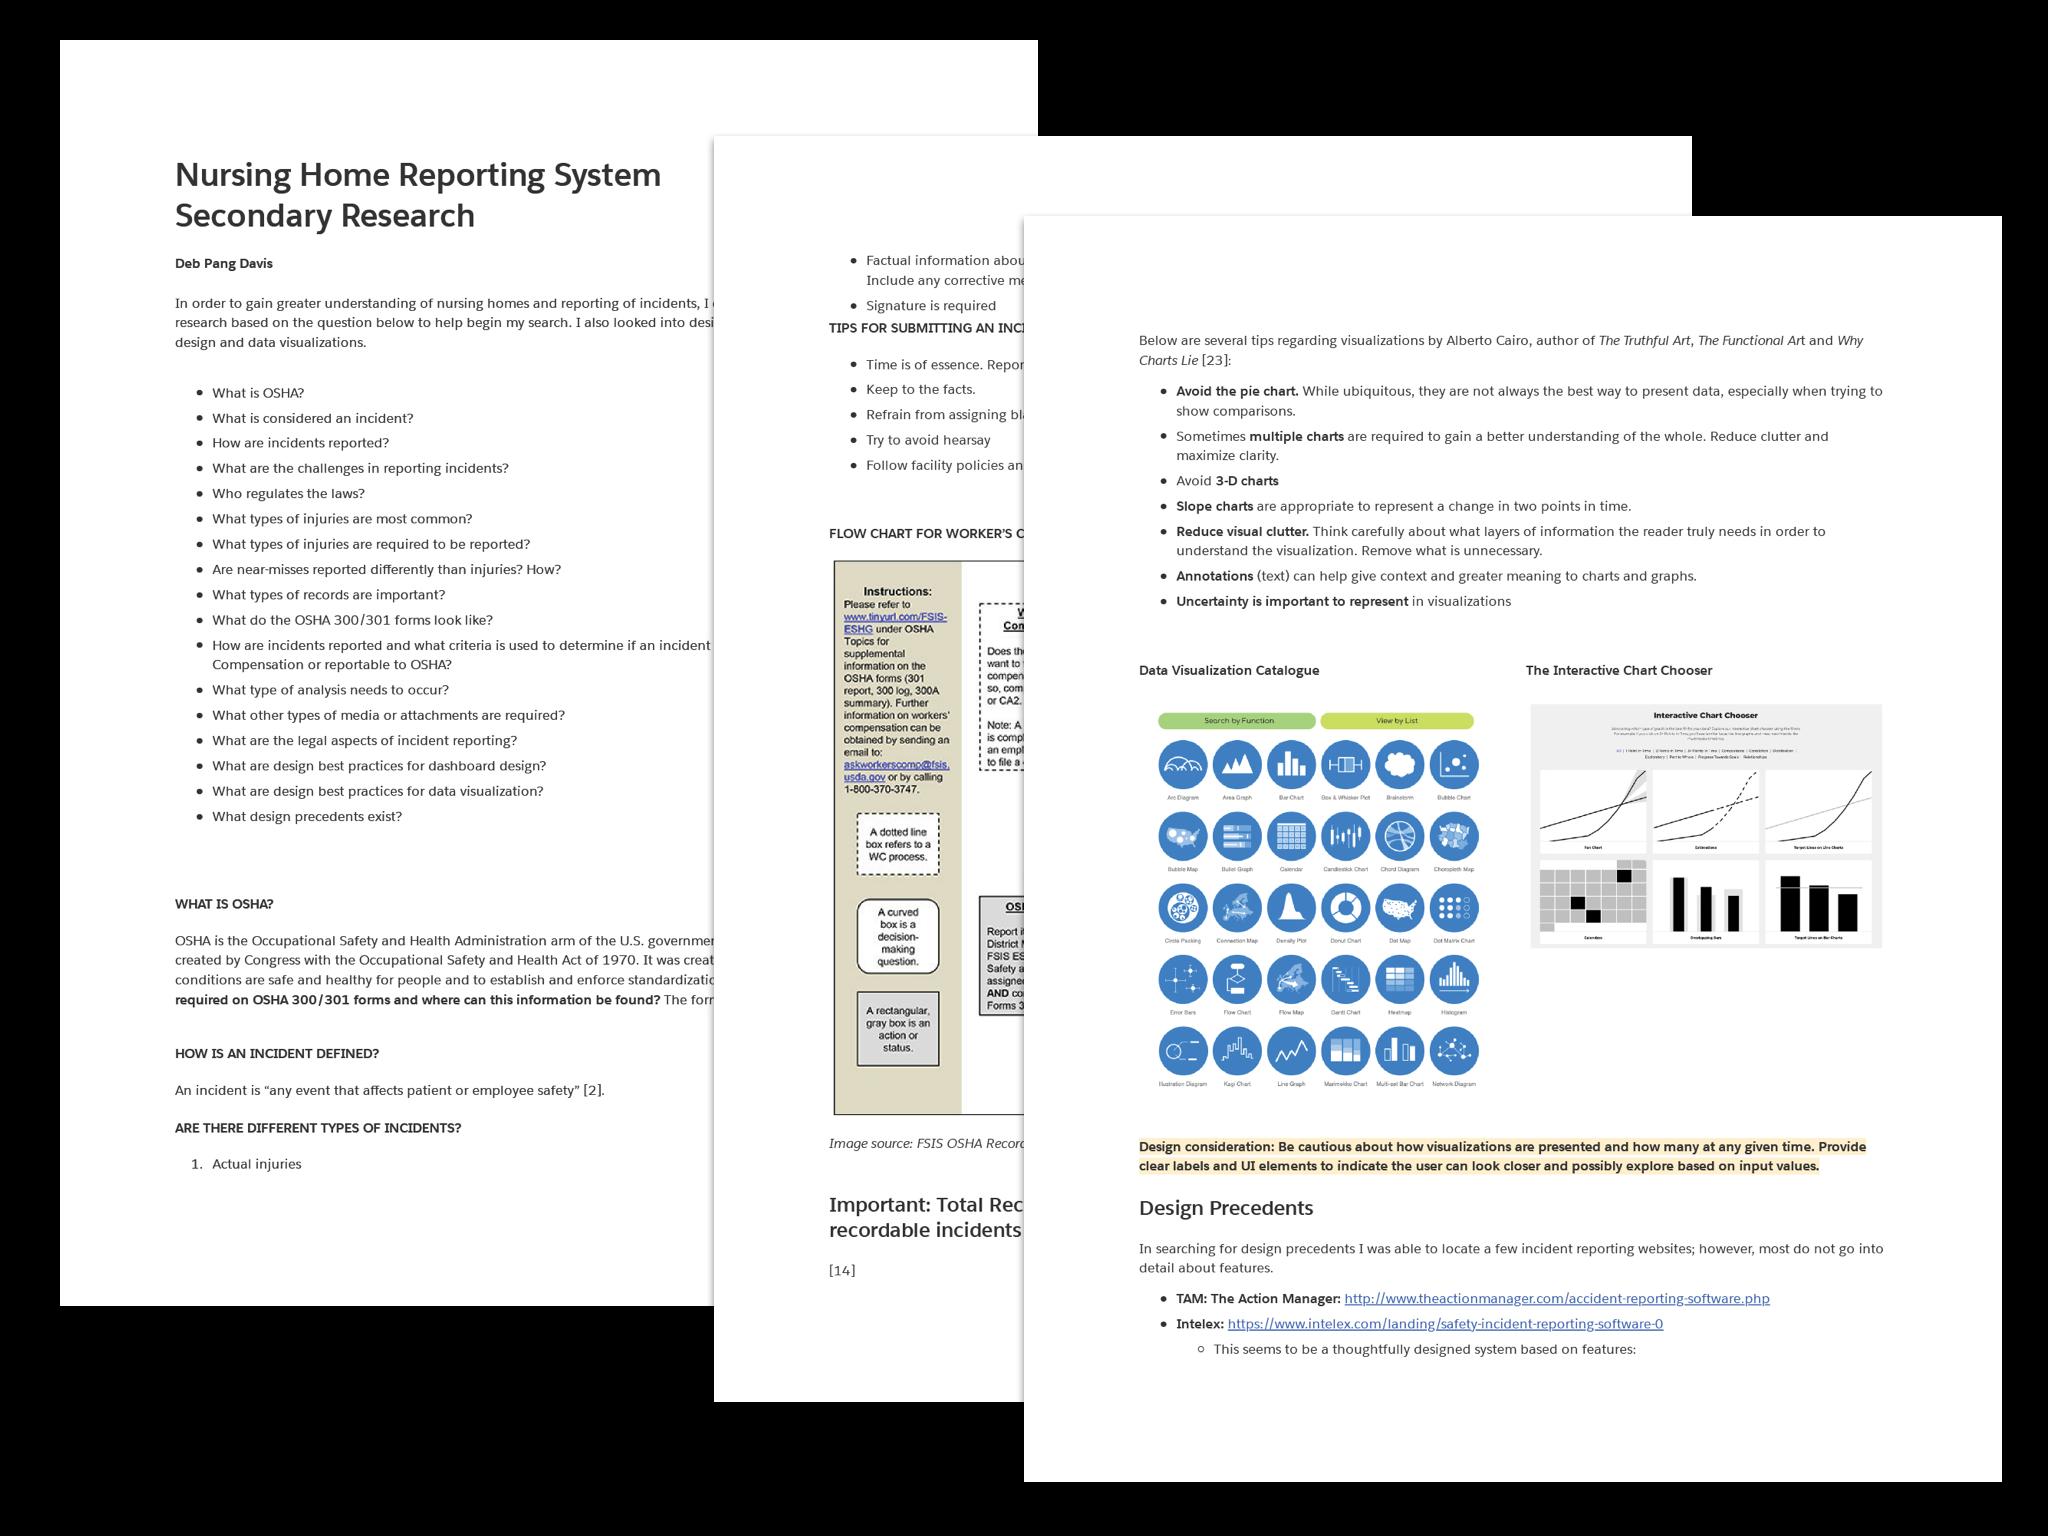 reportingSystem-secondaryResearch